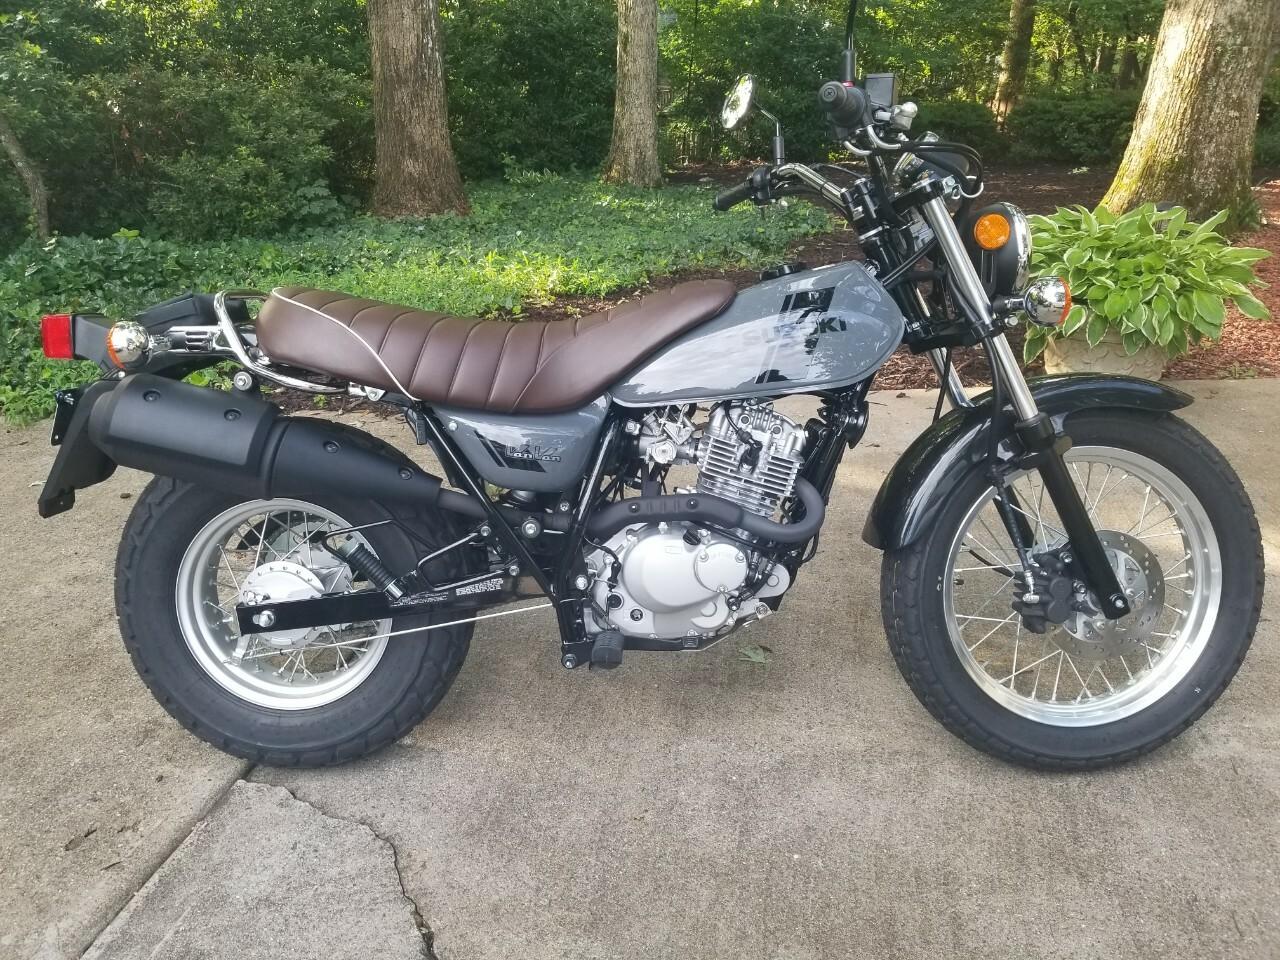 Vanvan 200 For Sale - Suzuki Motorcycles - Cycle Trader